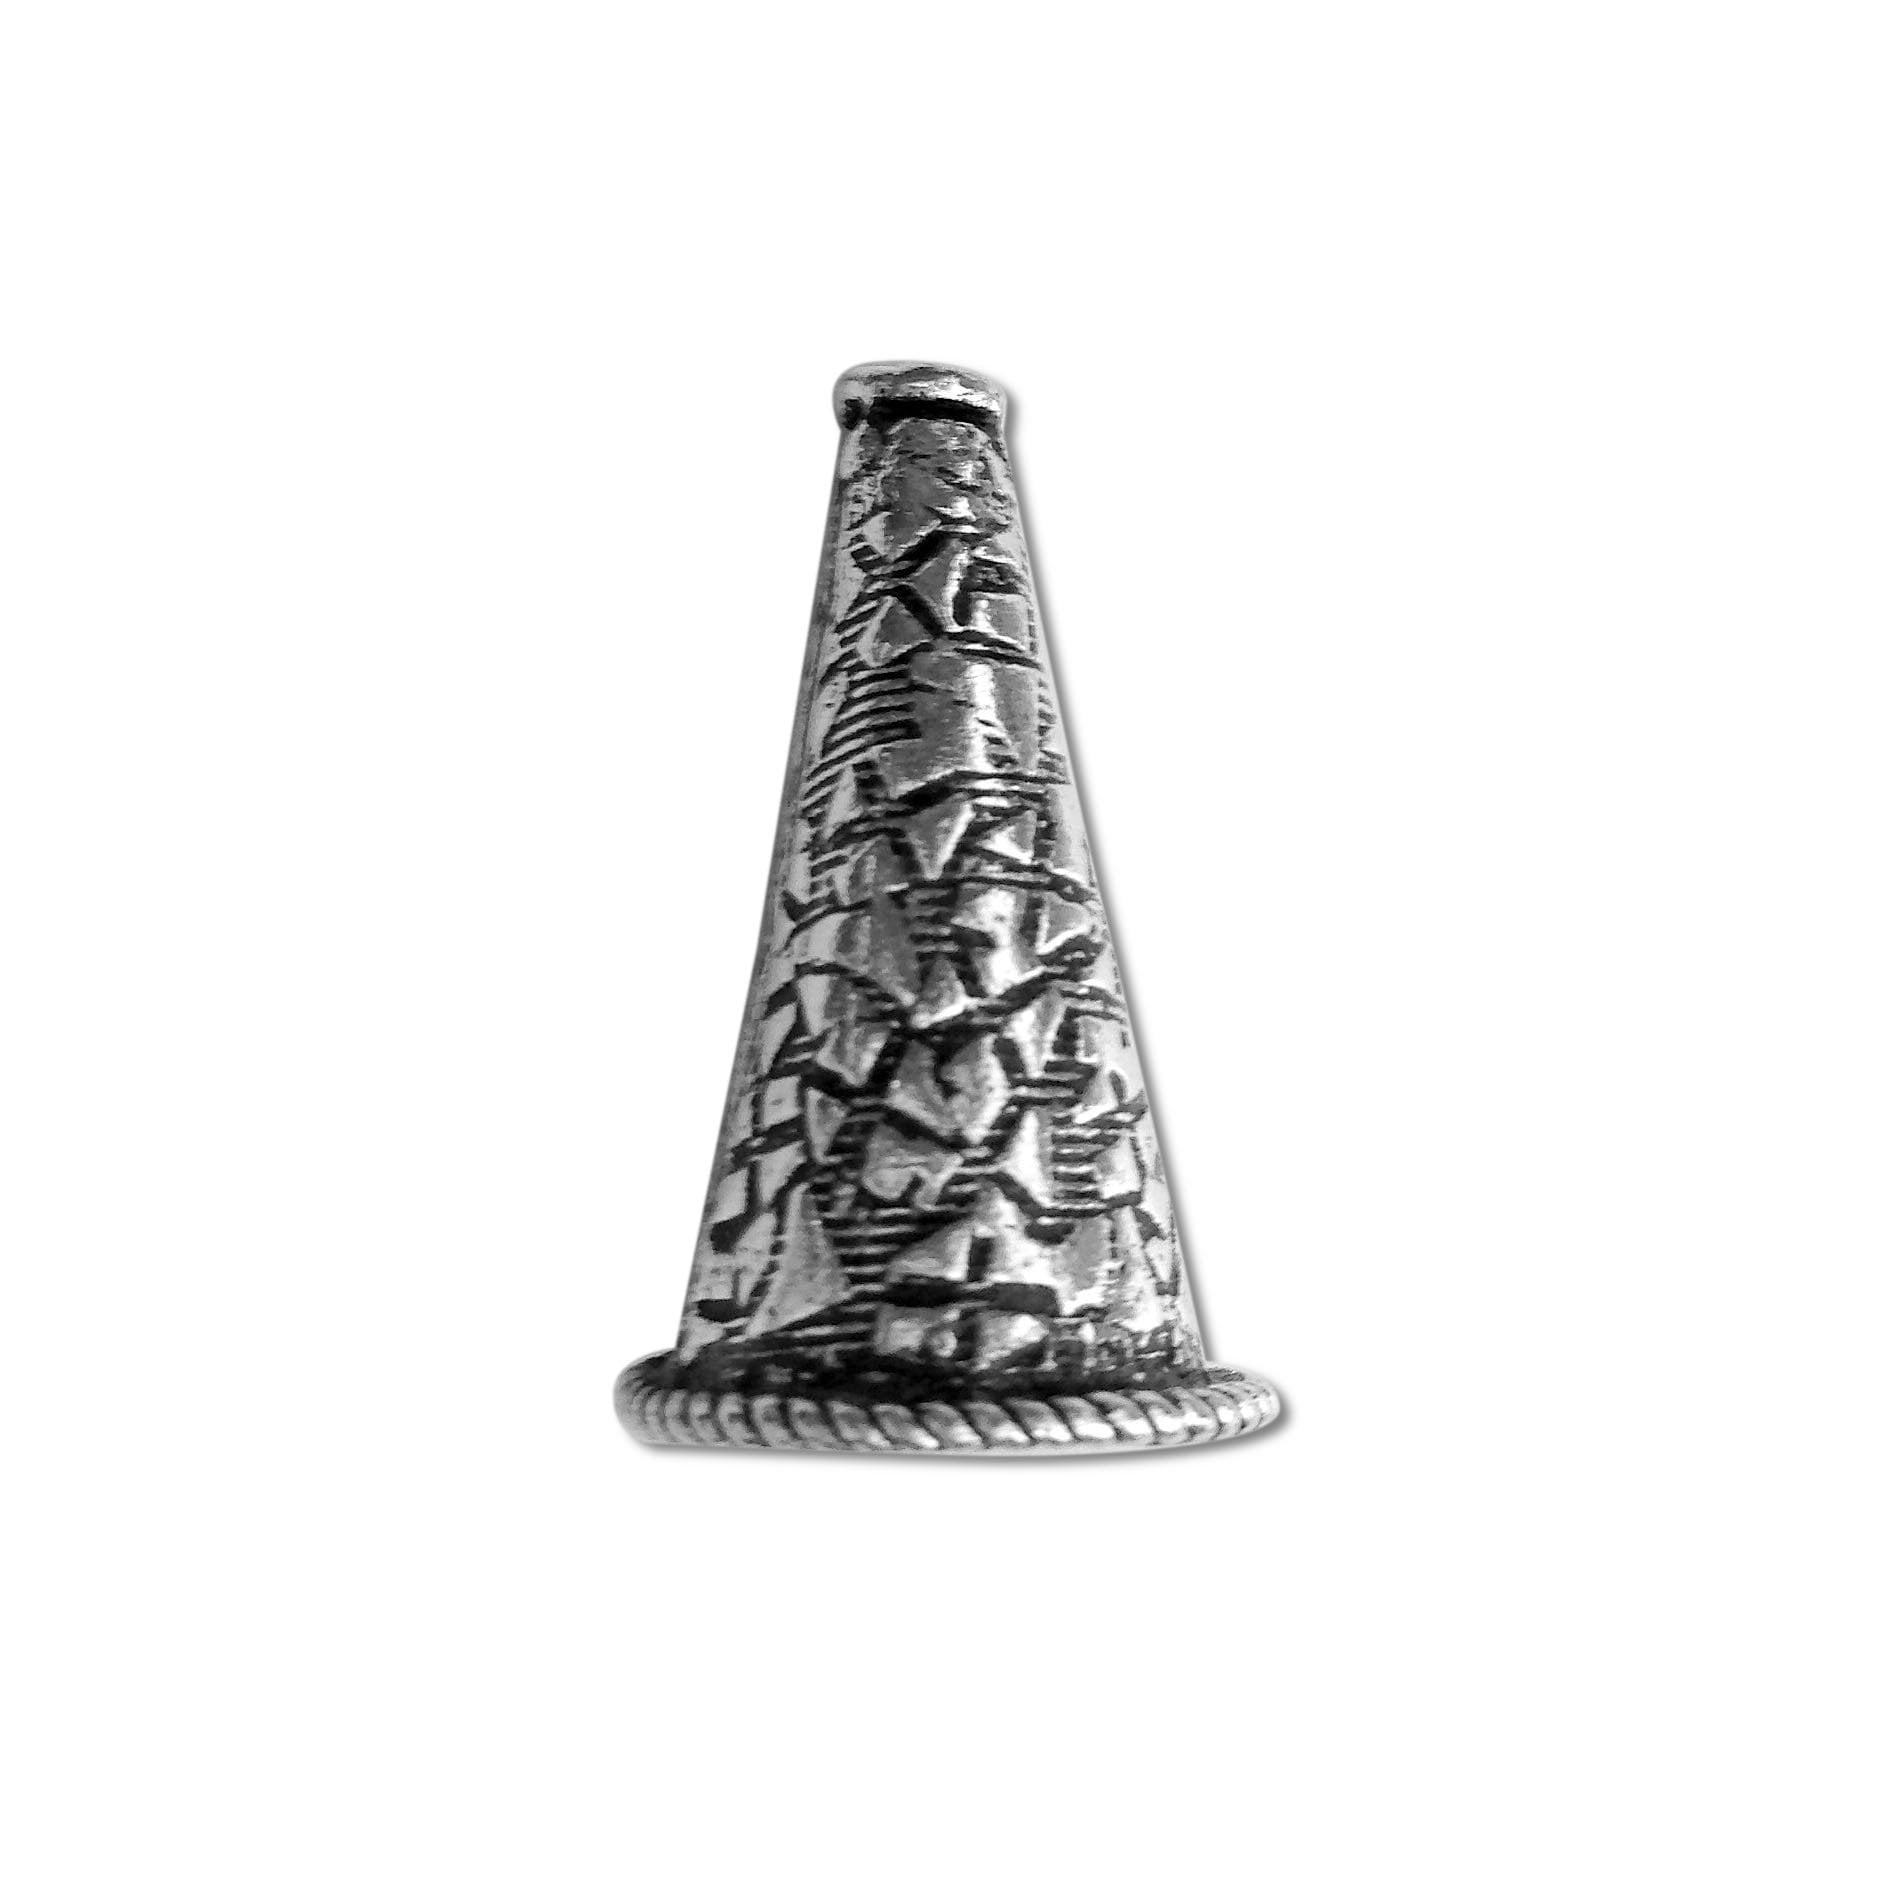 Silver Overlay Cone CSF-194